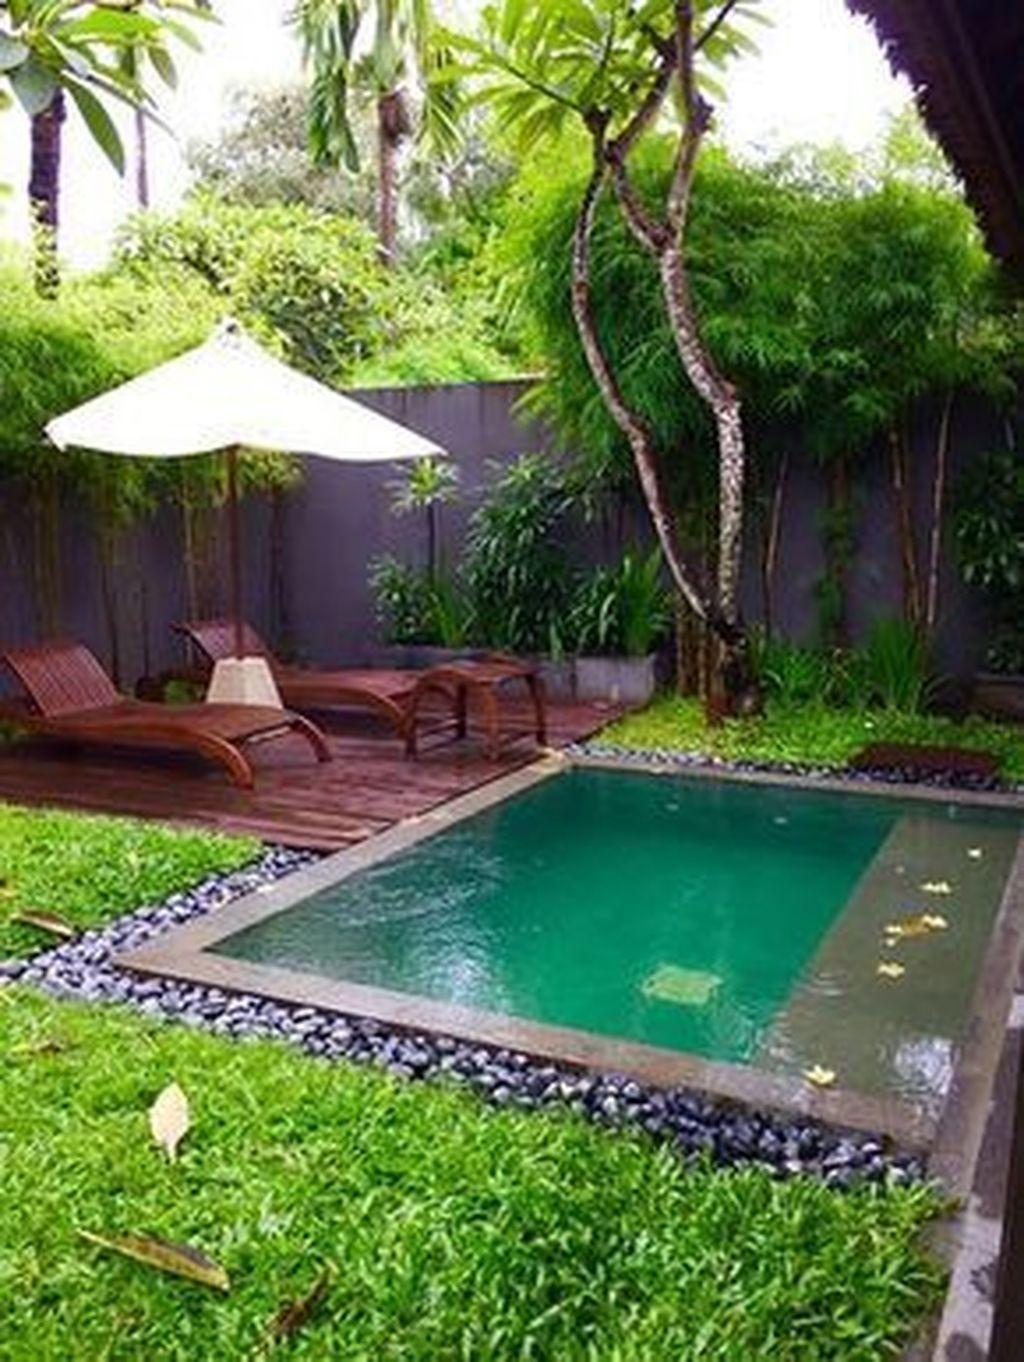 38 Inspirierende Gartenideen für Zuhause #backyardideas